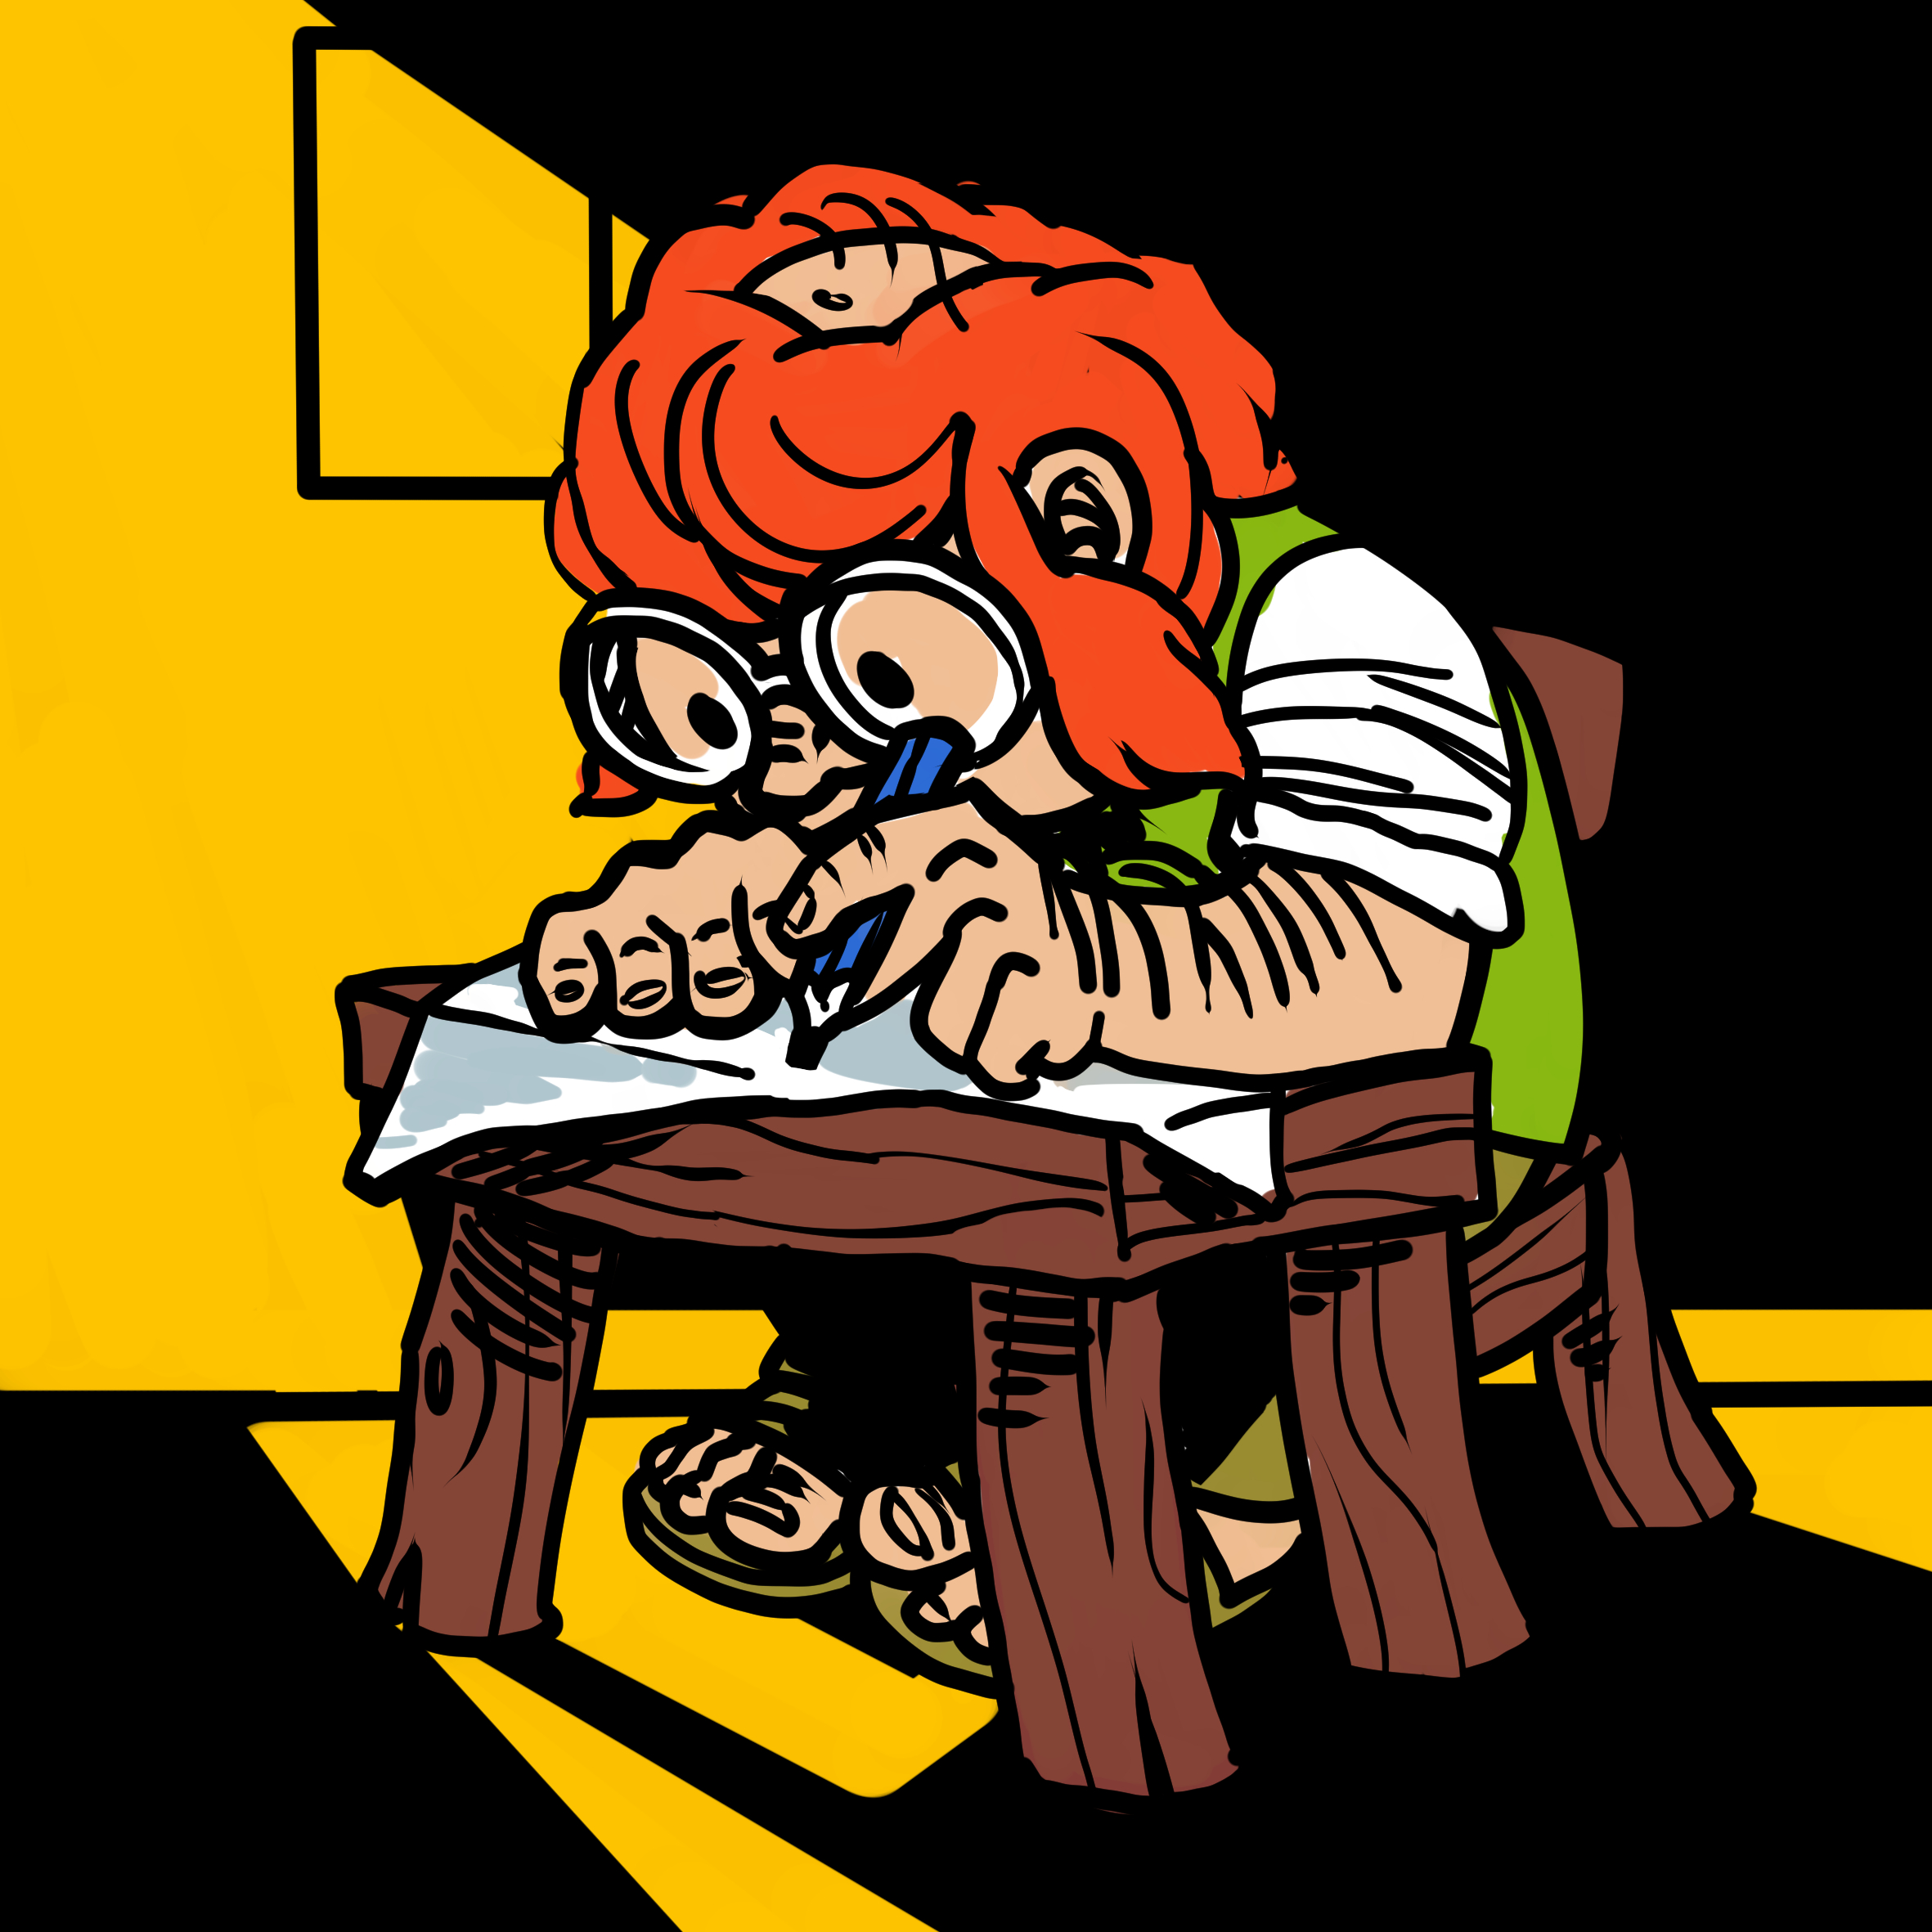 A gnome drawing at his desk